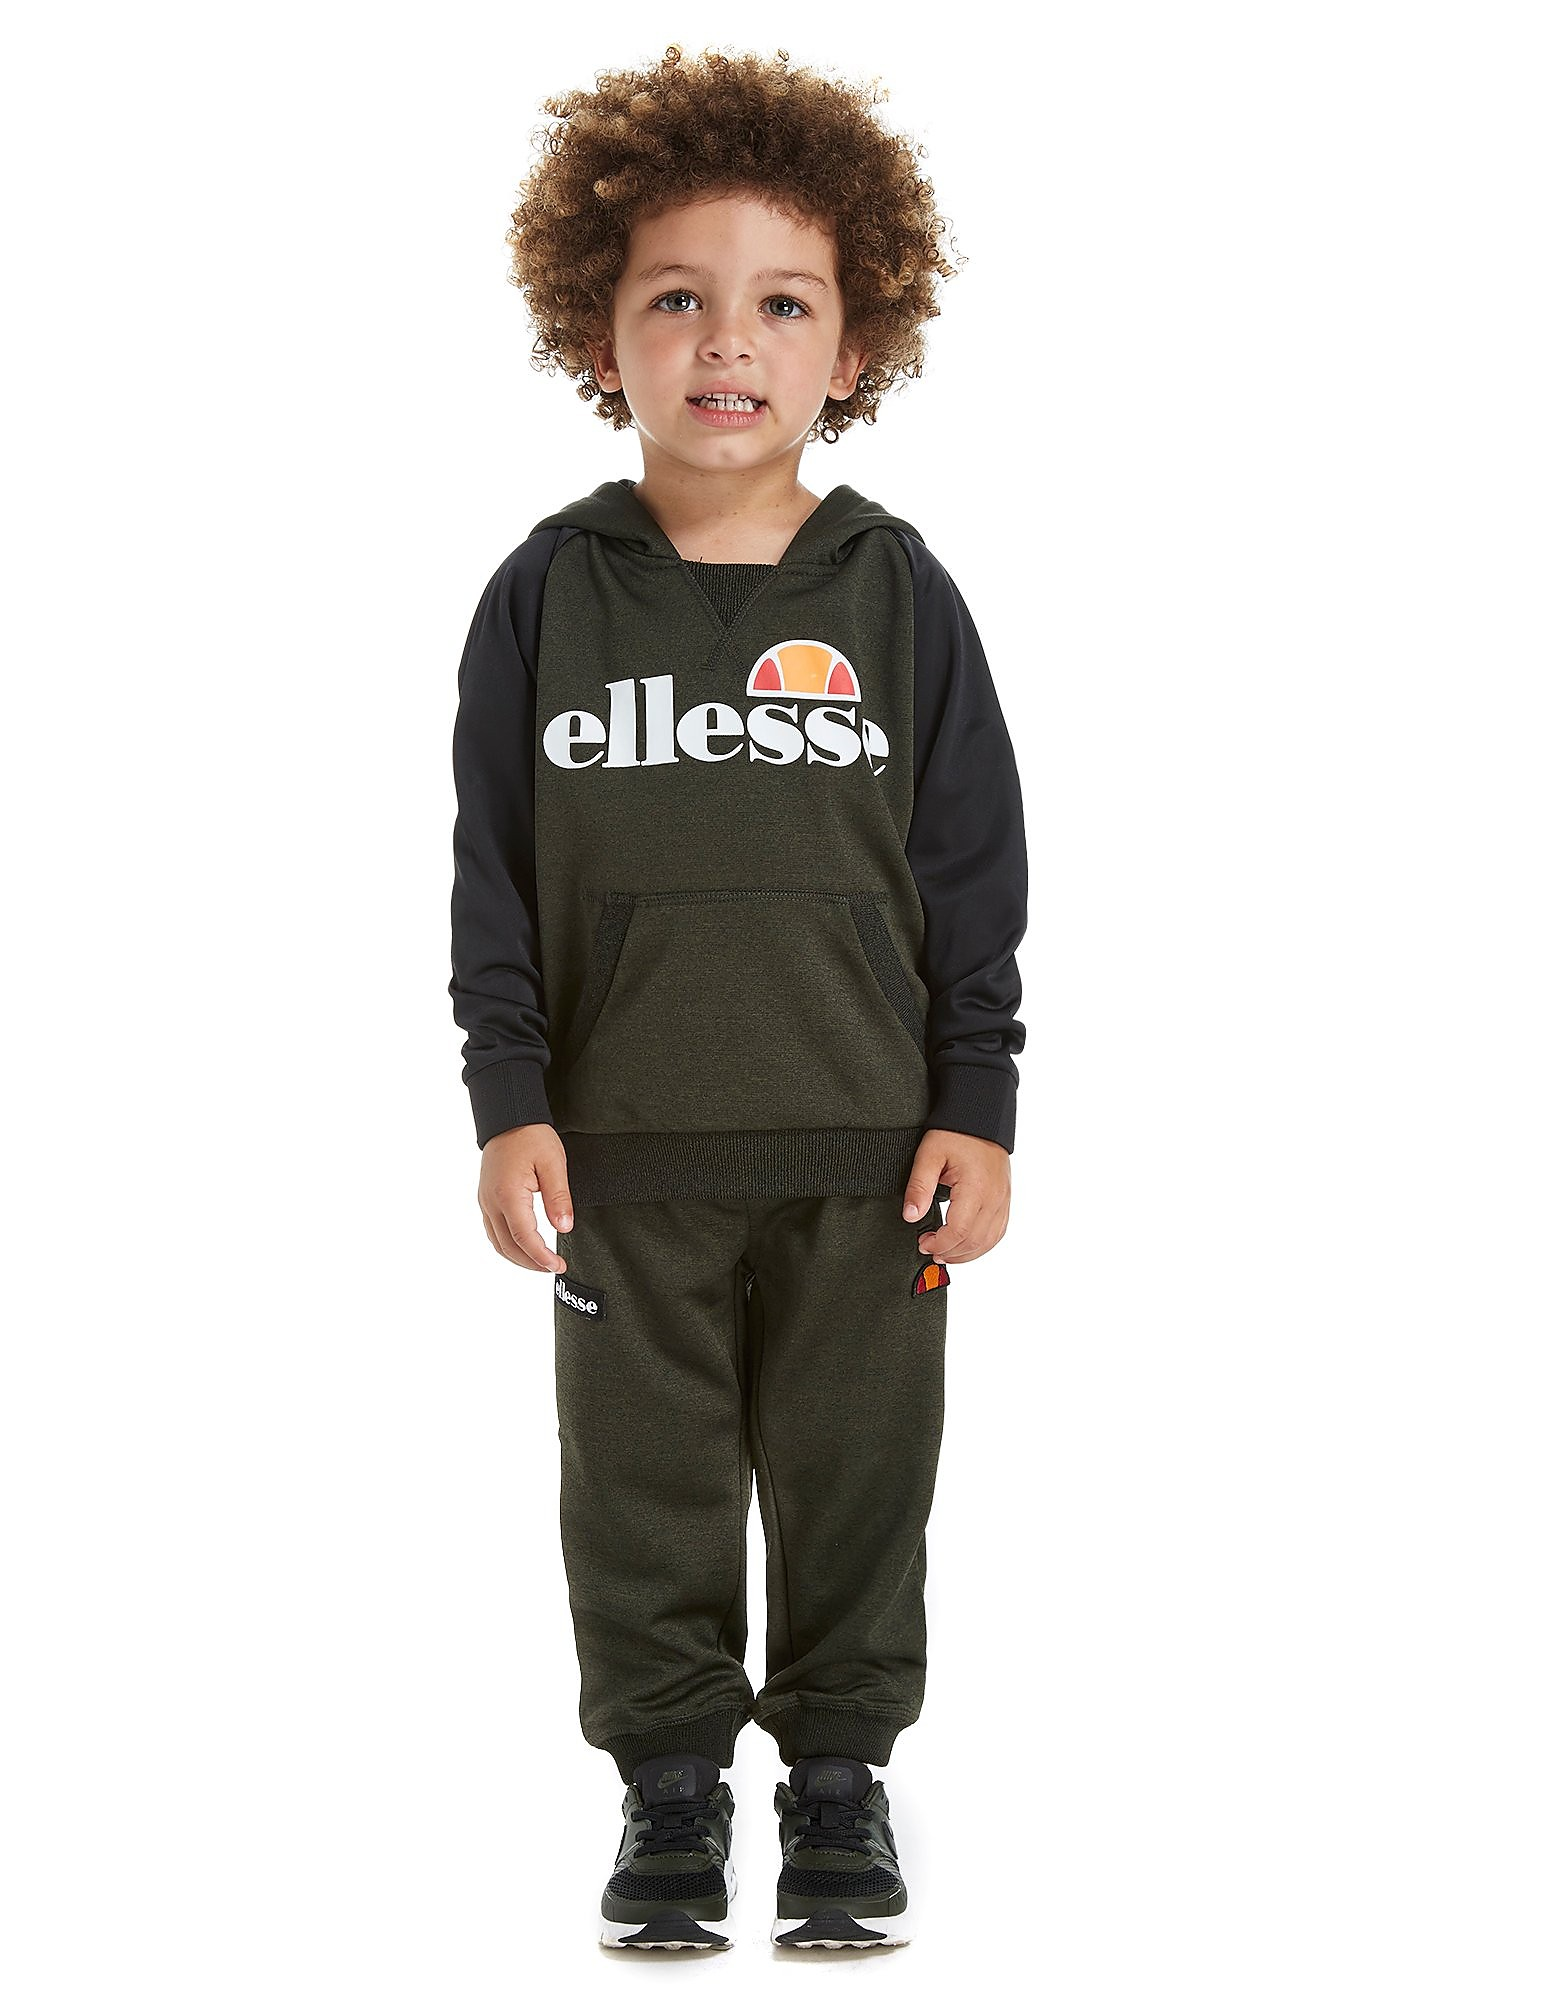 Ellesse Bervo Hoody Suit Children